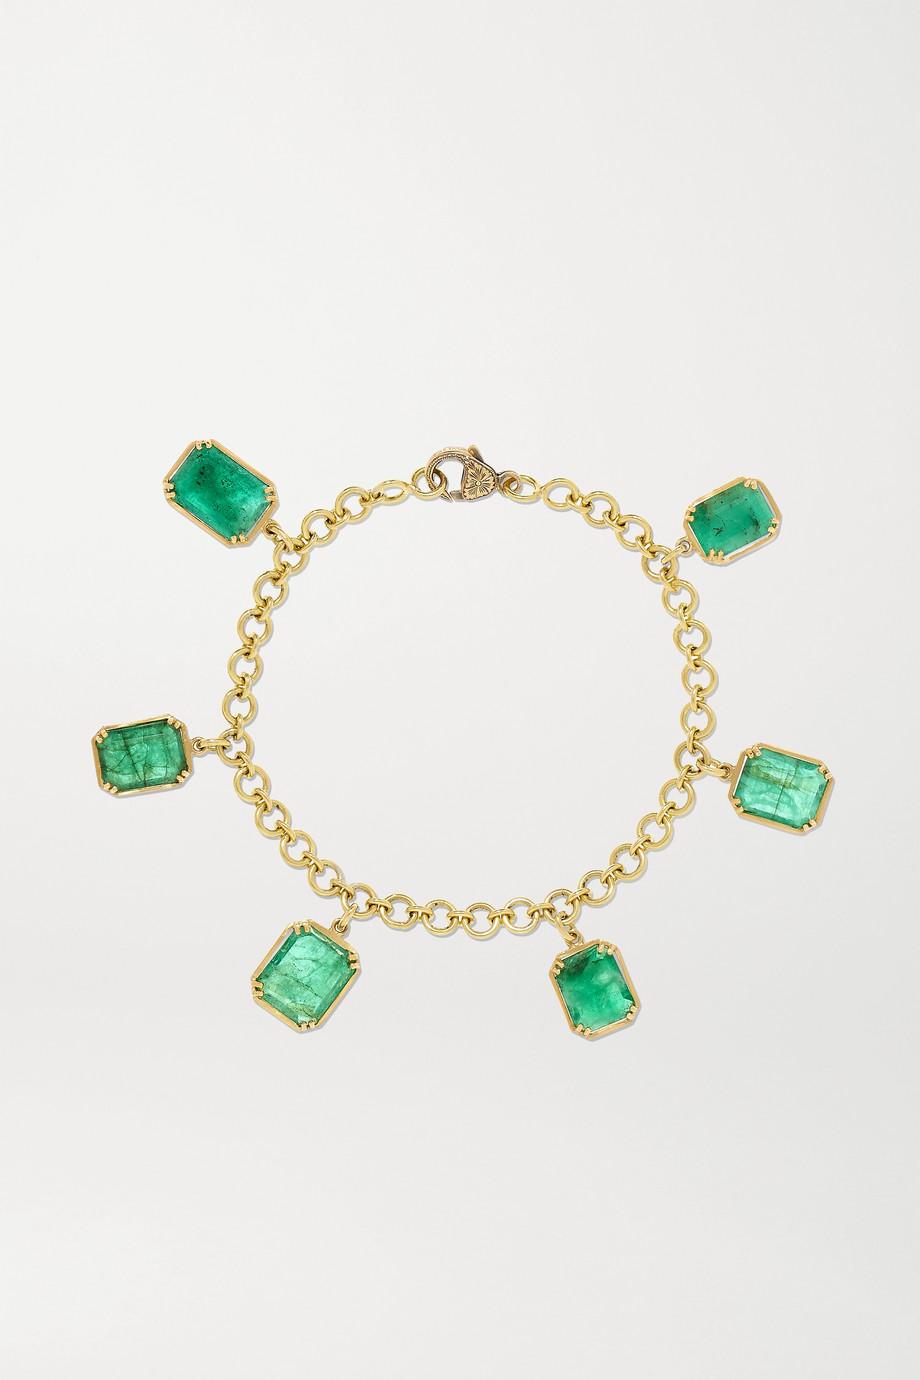 Sylva & Cie Armband aus 18 Karat Gold mit Smaragden